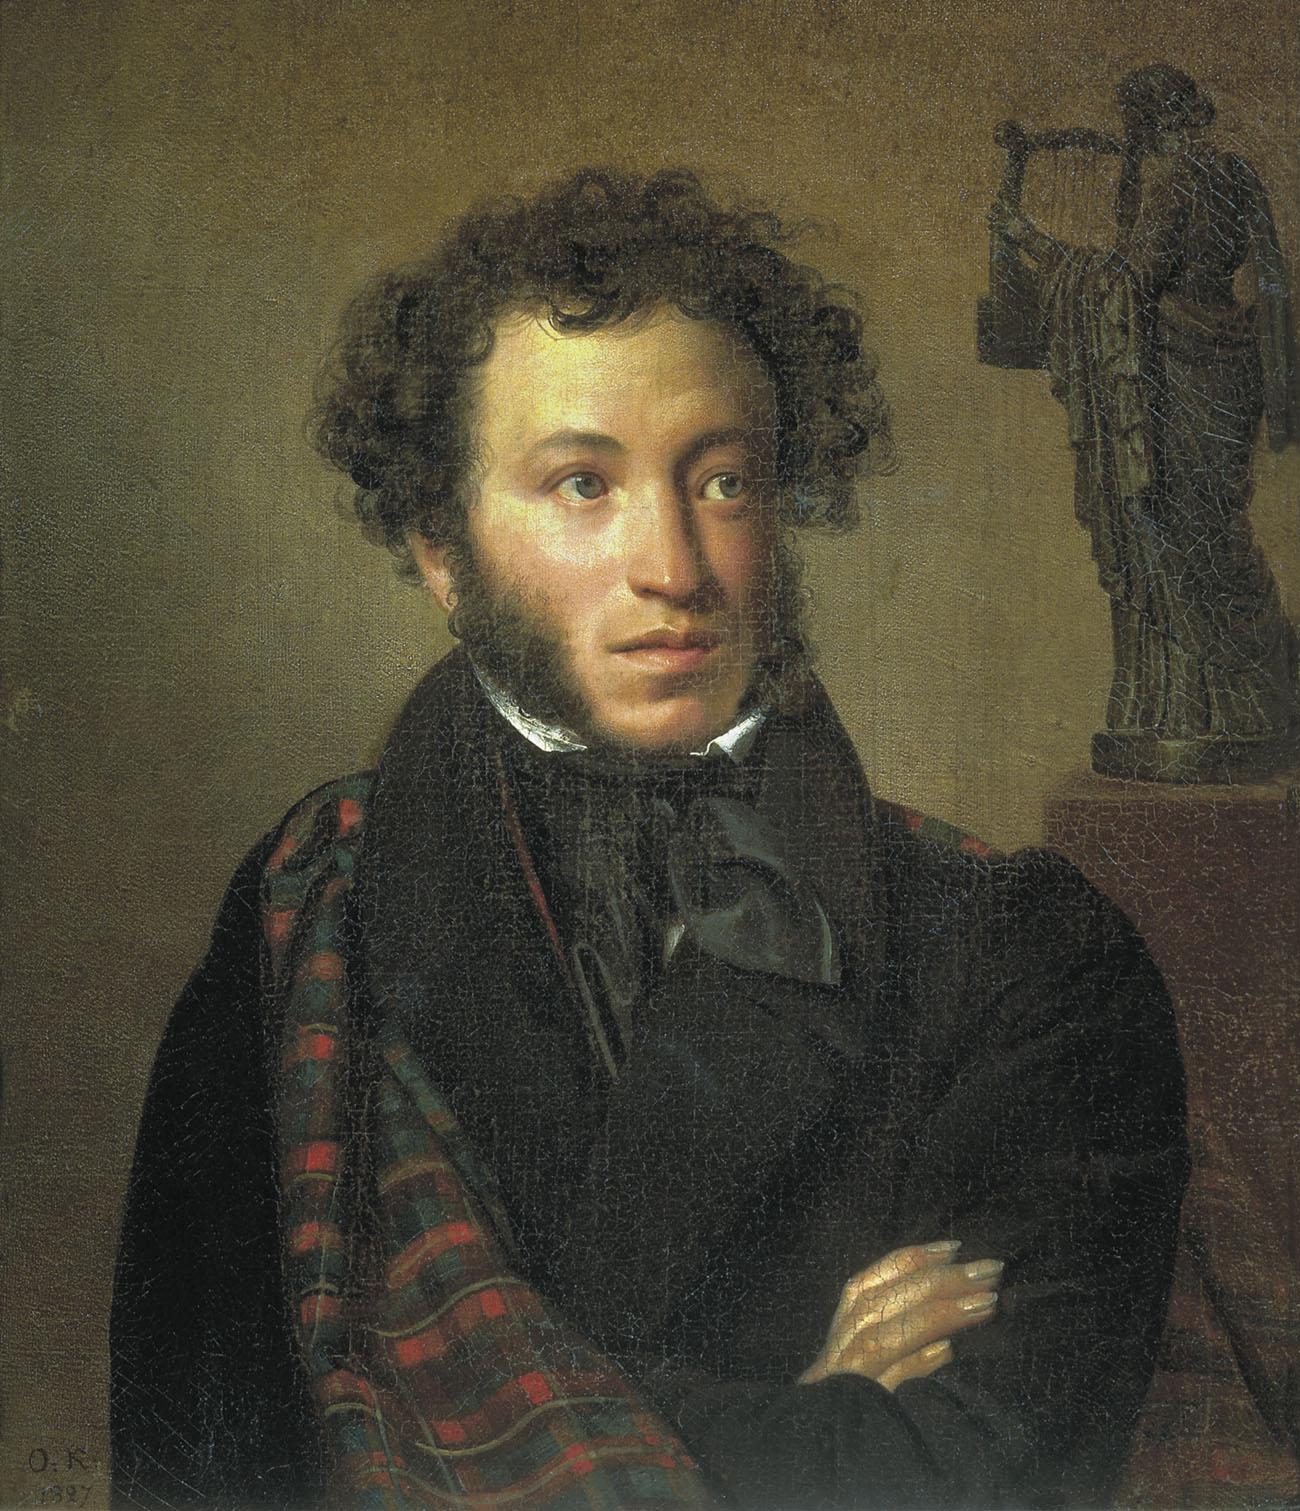 Пушкин Александр Сергеевич - фотографии